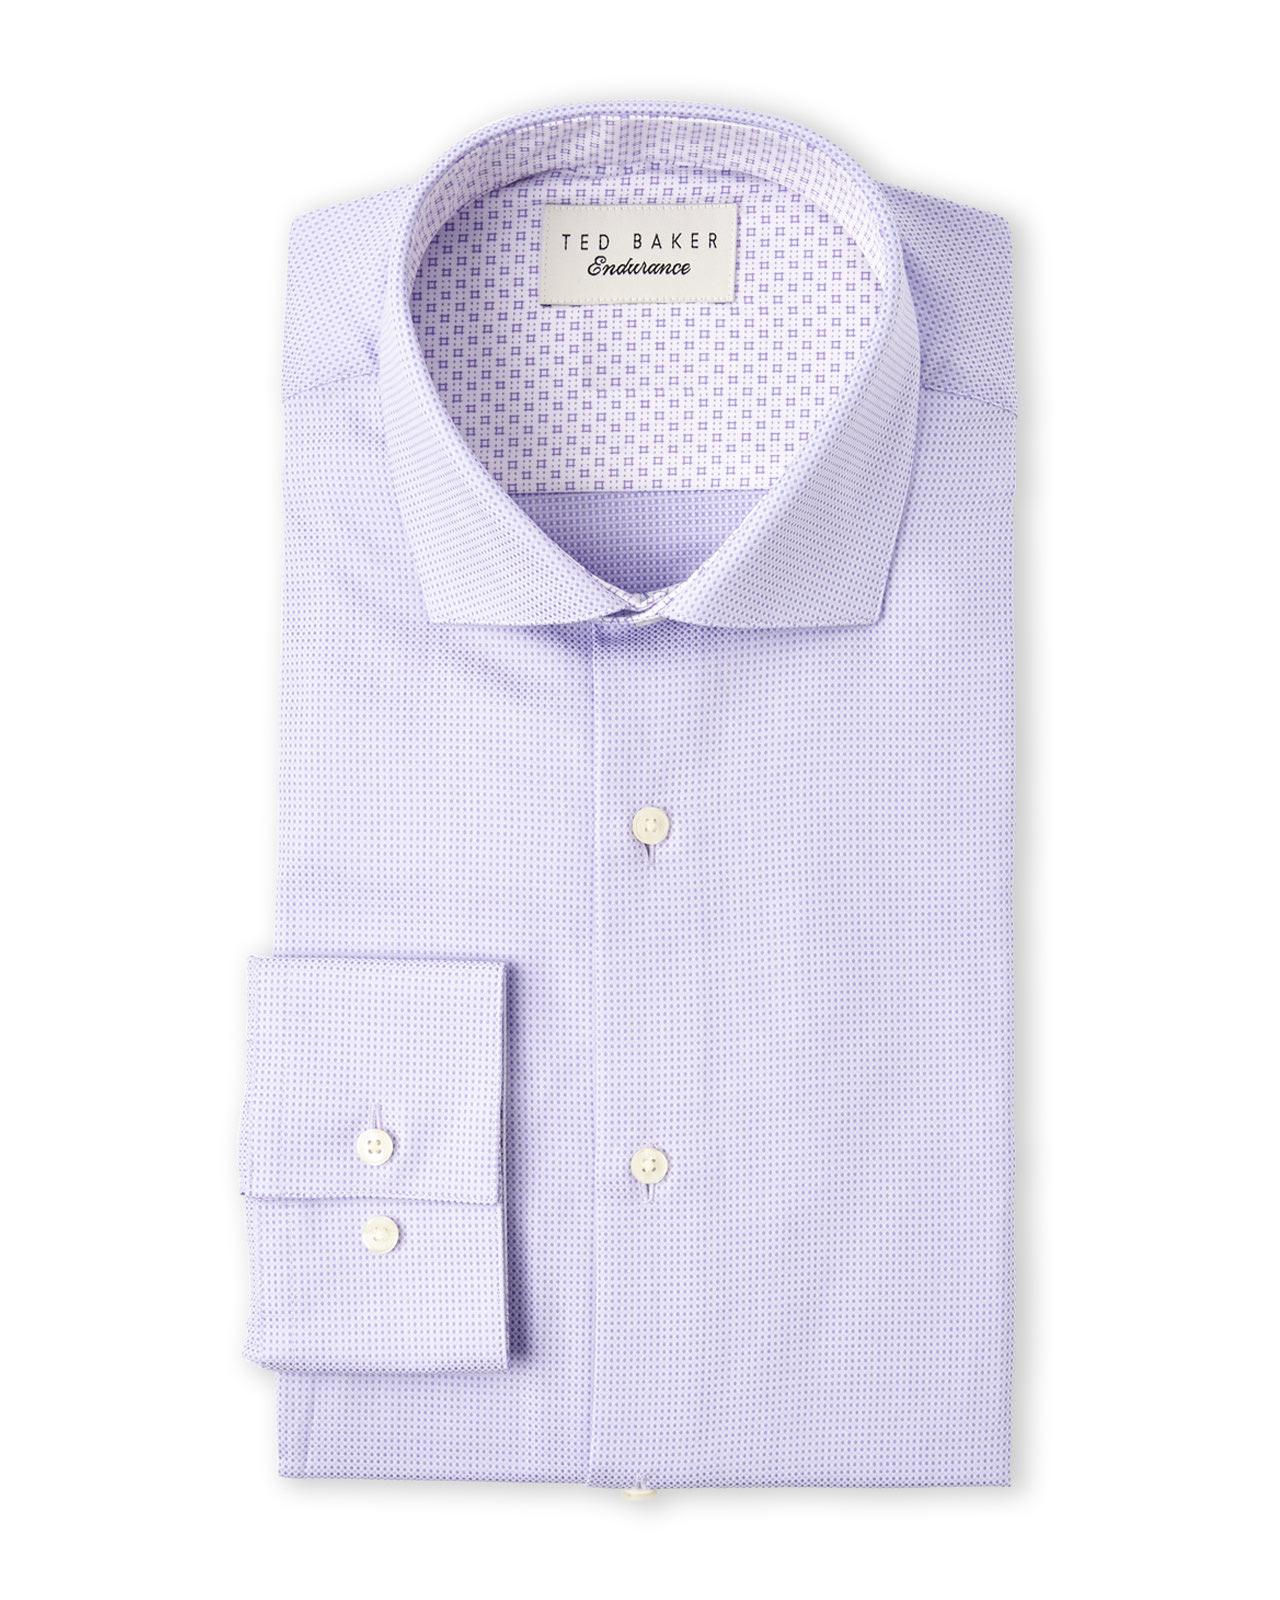 743aada2eeee2 Lyst - Ted Baker Endurance Purple Beal Slick Rick Dress Shirt in ...